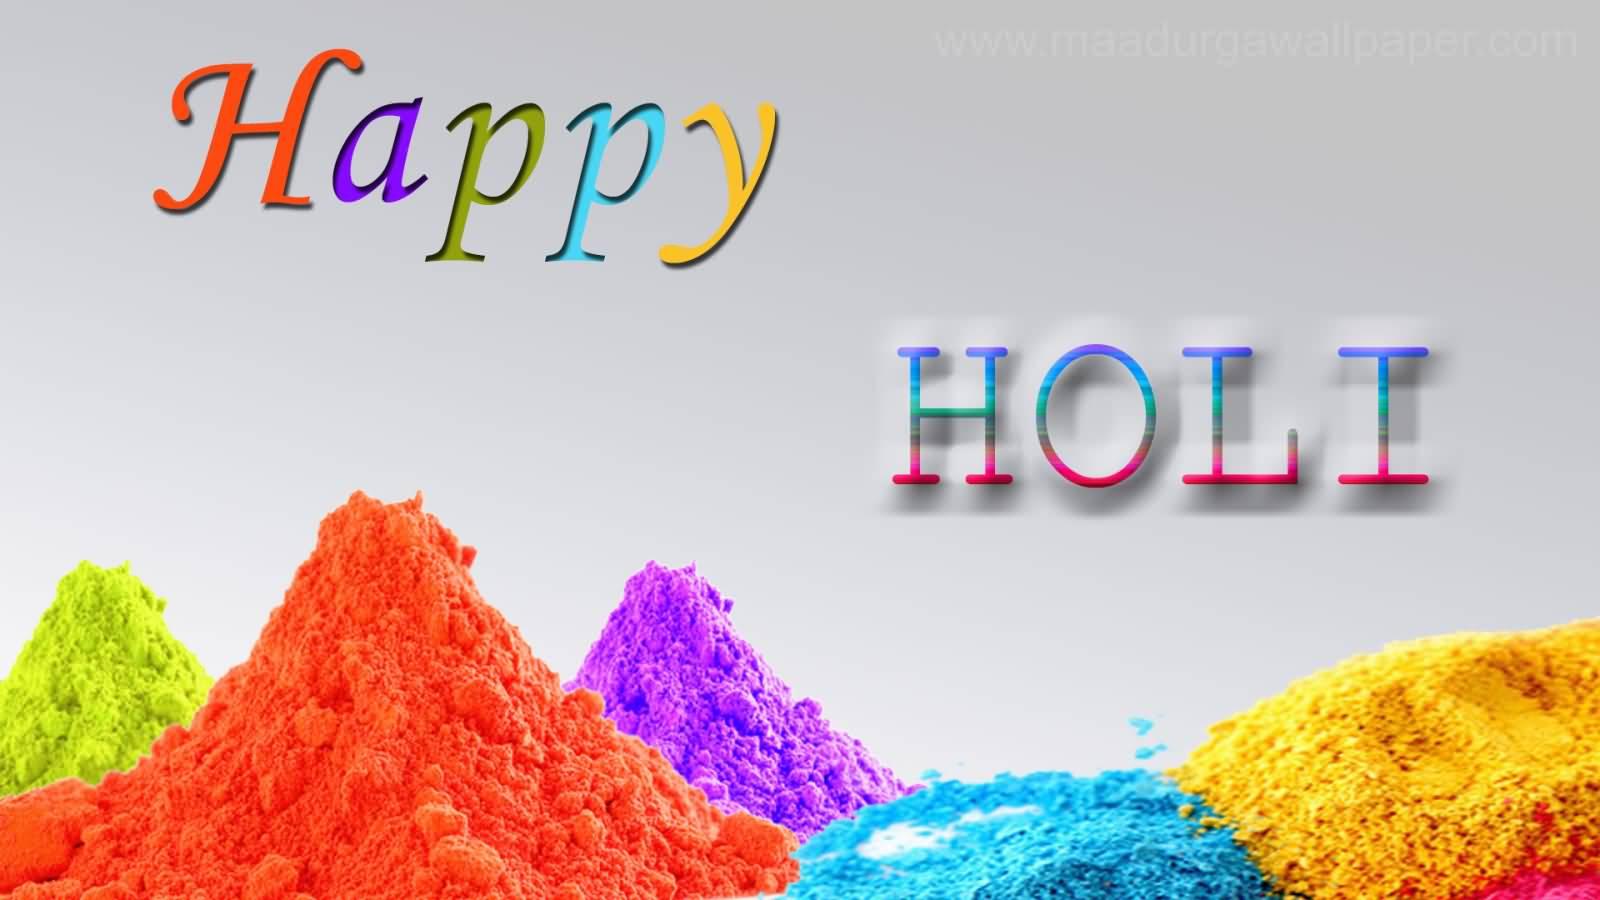 Happy Holi 2019 Good Morning Wish Images For Whatsapp Happy Holi 2019